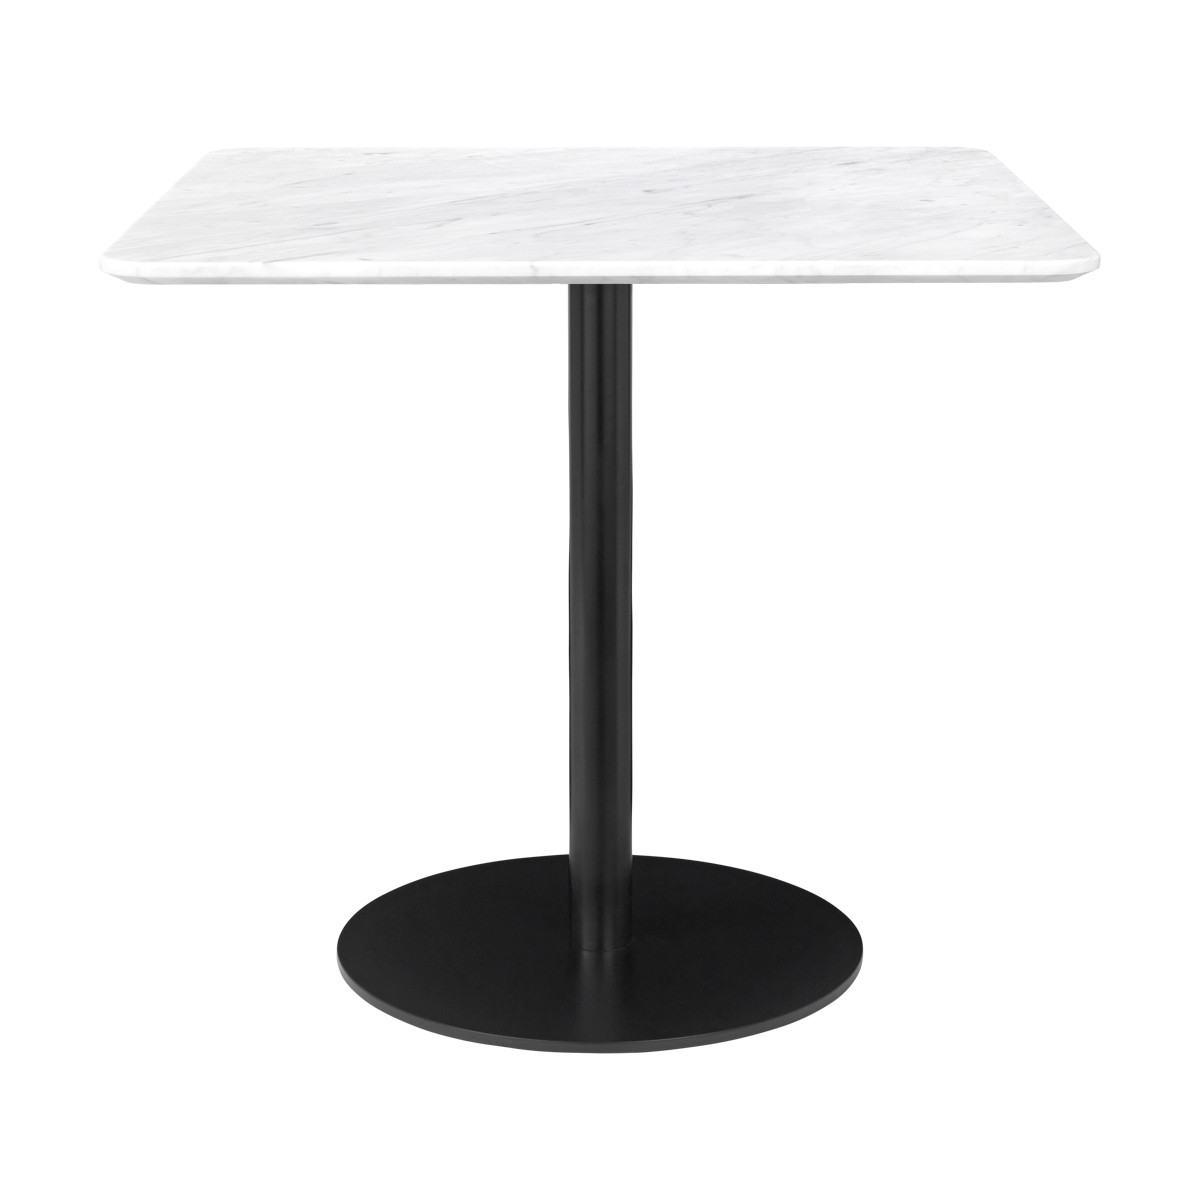 GUBI 1.0 Dining Table - 80x80